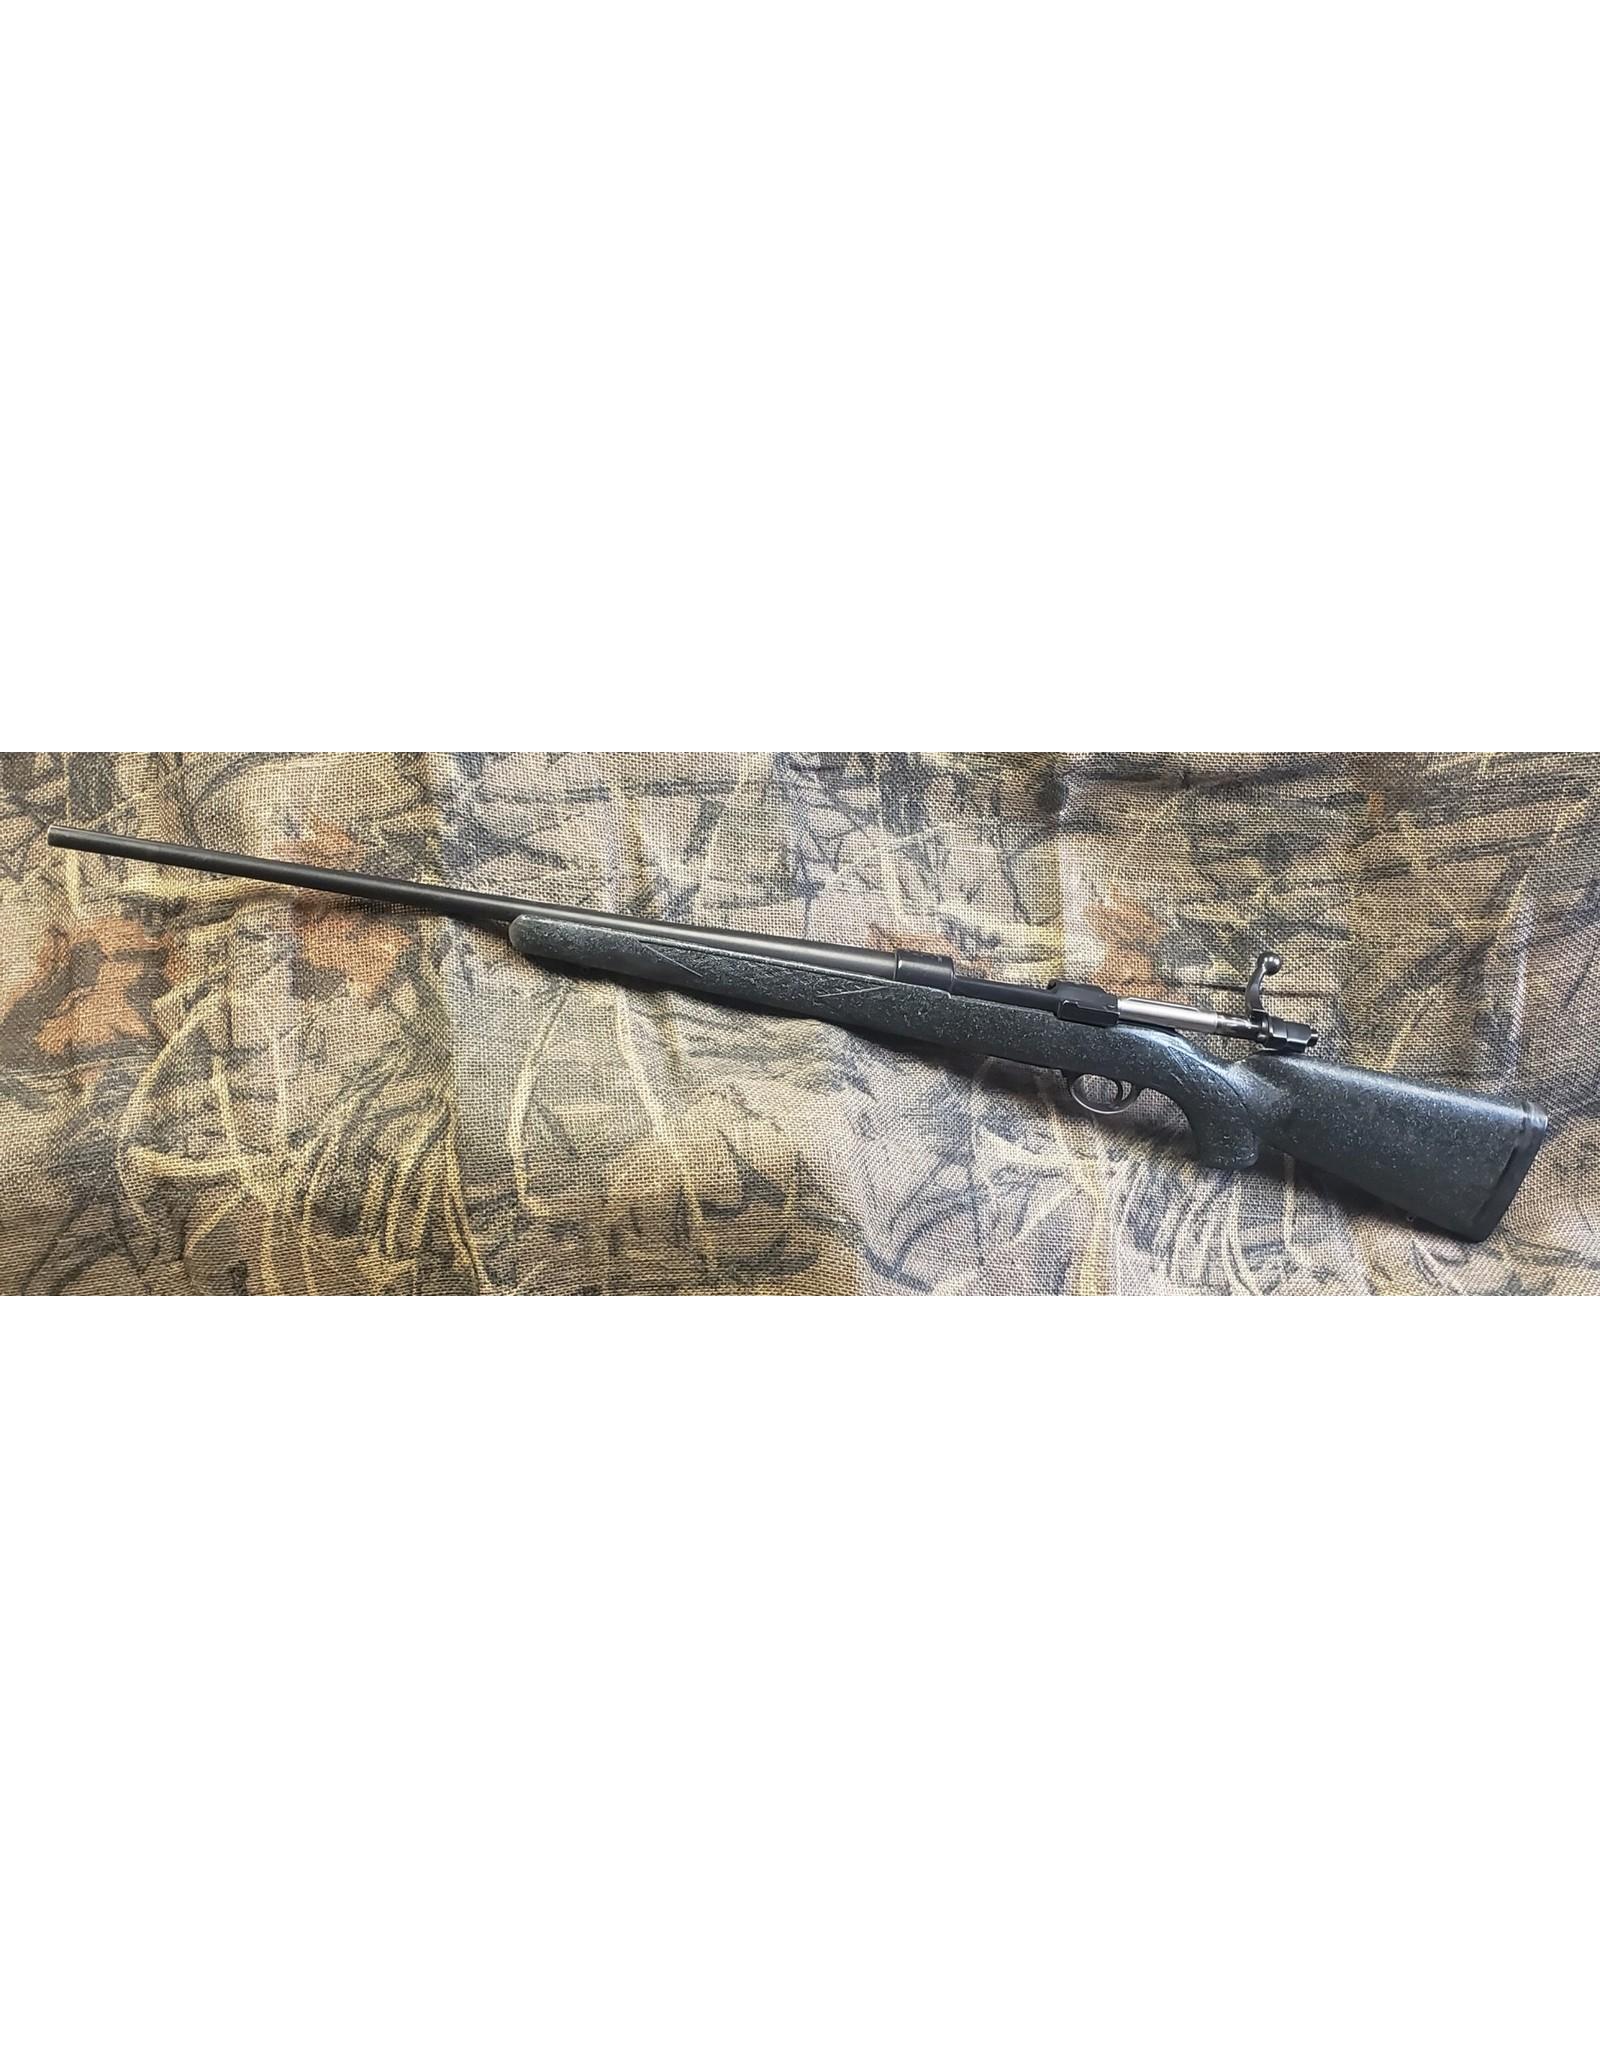 HUSK SWED MAUSER USED HUSK SWED MAUSER M98 9.32X62